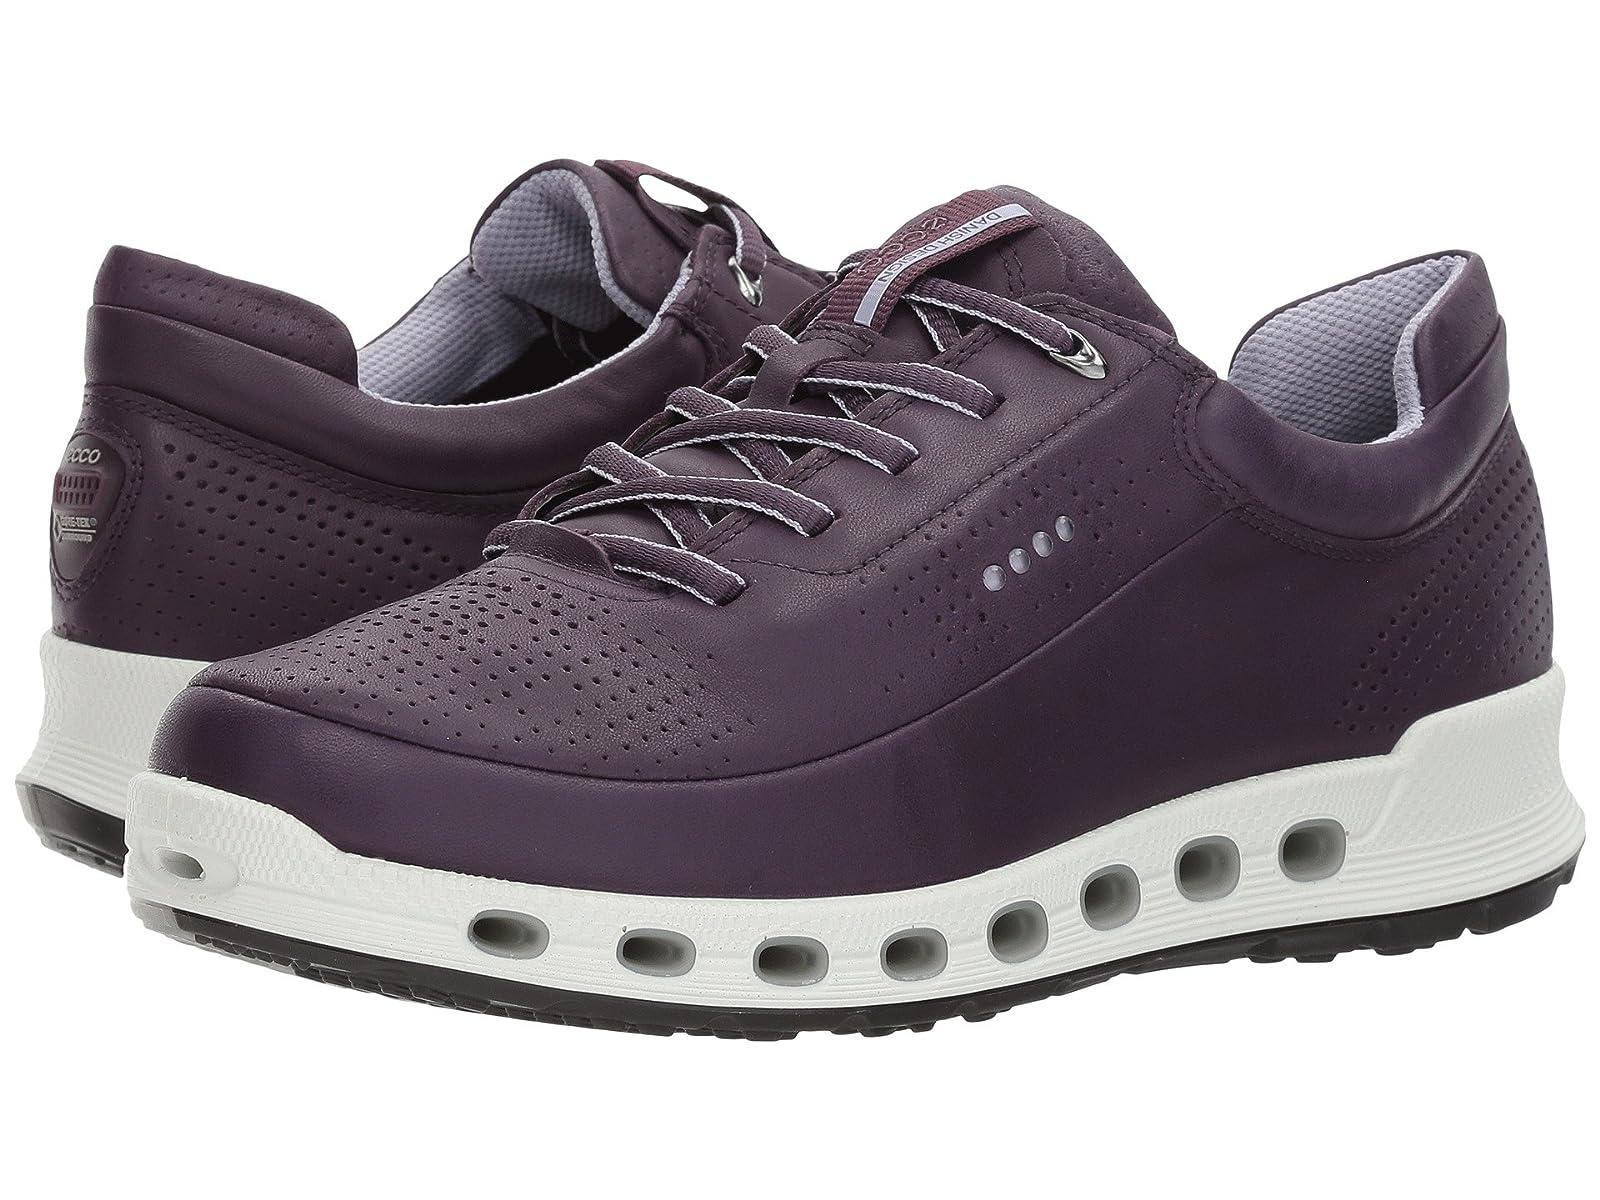 ECCO Sport Cool 2.0 Gore-Tex SneakerCheap and distinctive eye-catching shoes